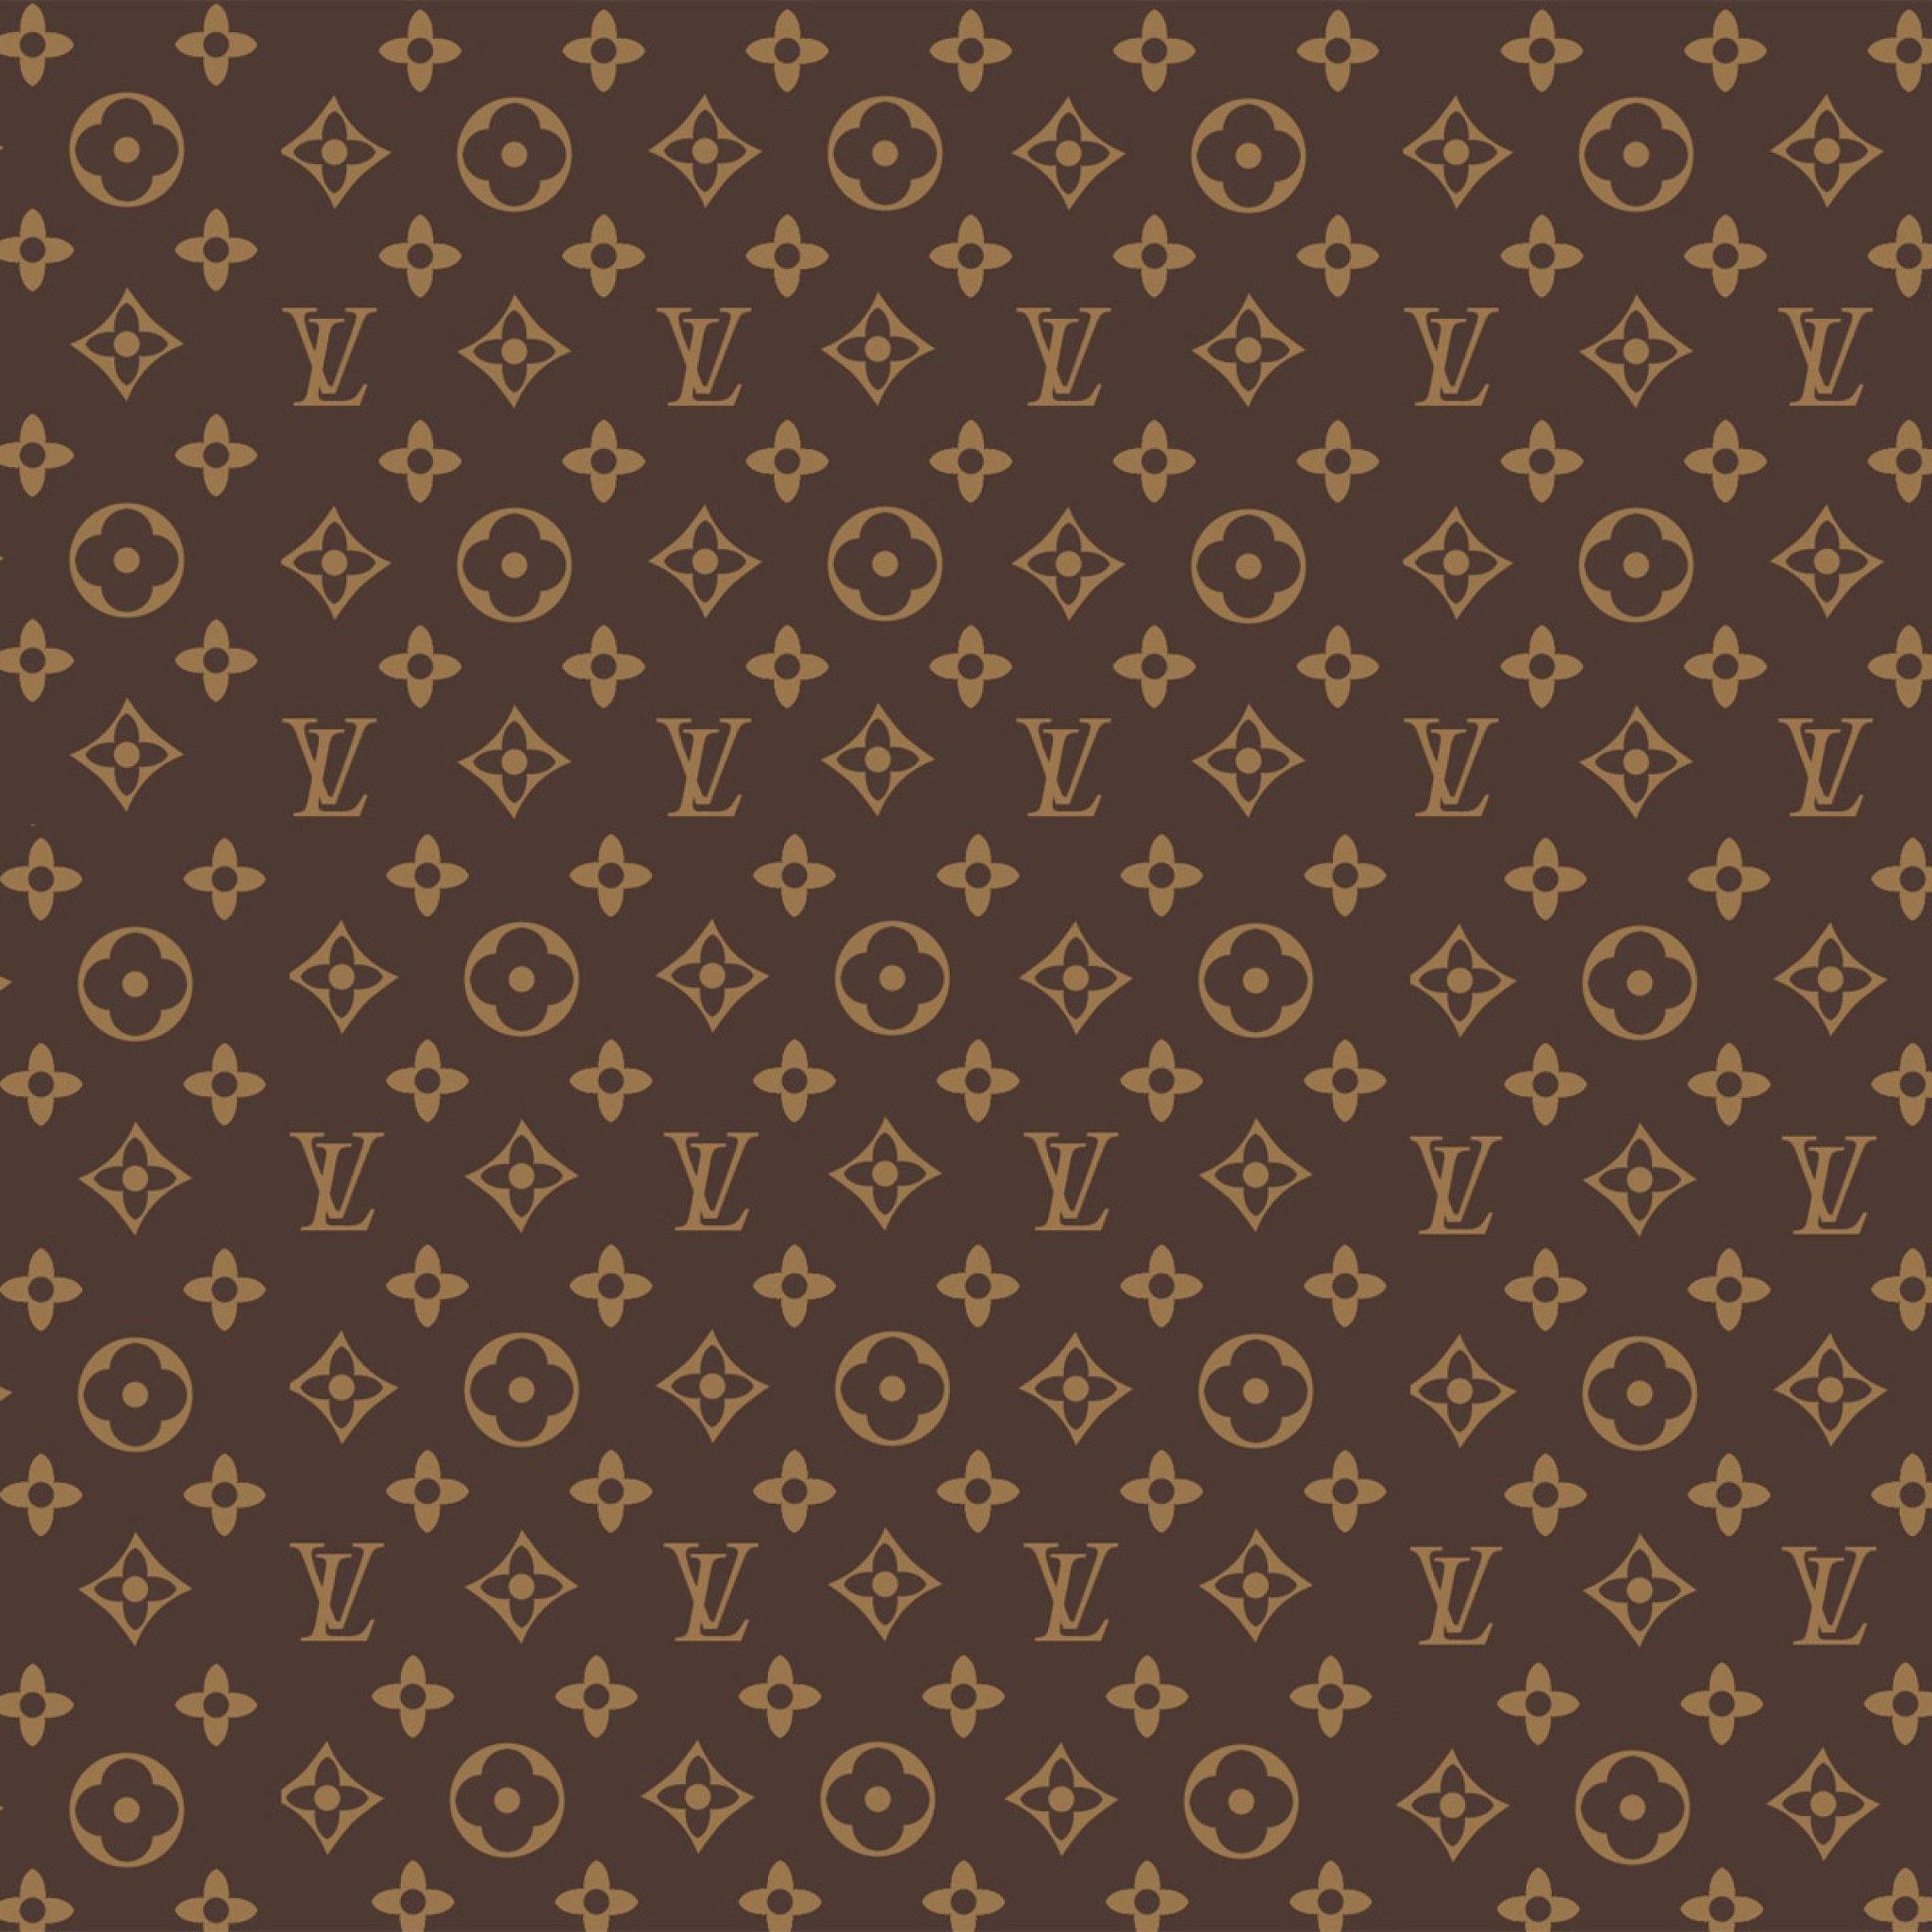 Bamboo design ipad air 2 wallpapers ipad air 2 wallpapers - Louis Vuitton Print Ipad Air Wallpaper Download Iphone